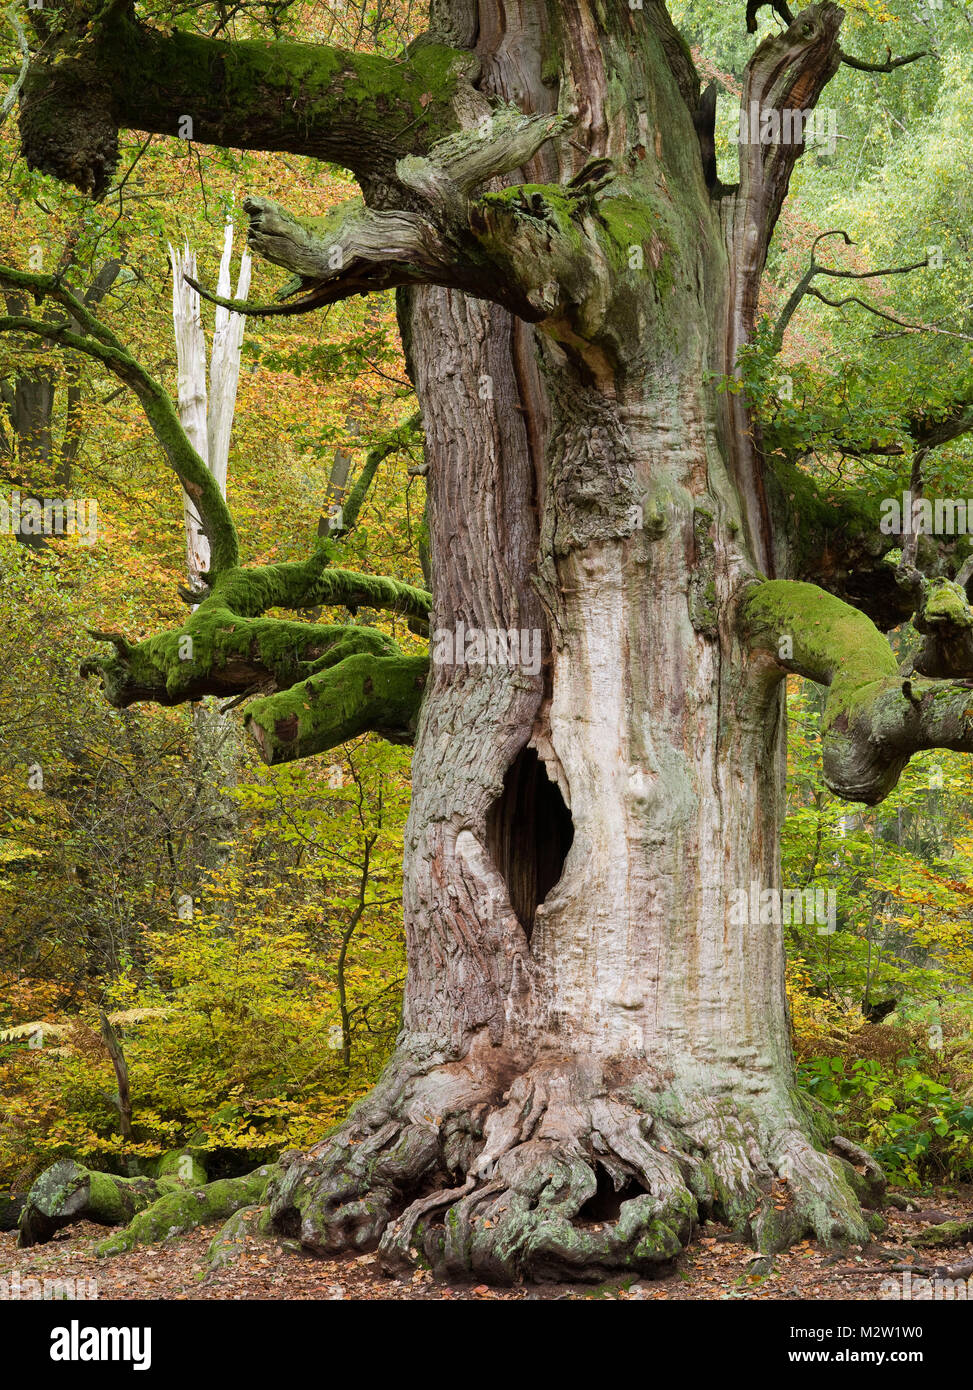 Kamineiche (oak), Urwald Sababurg, Reinhardswald, Hessia, Germany - Stock Image